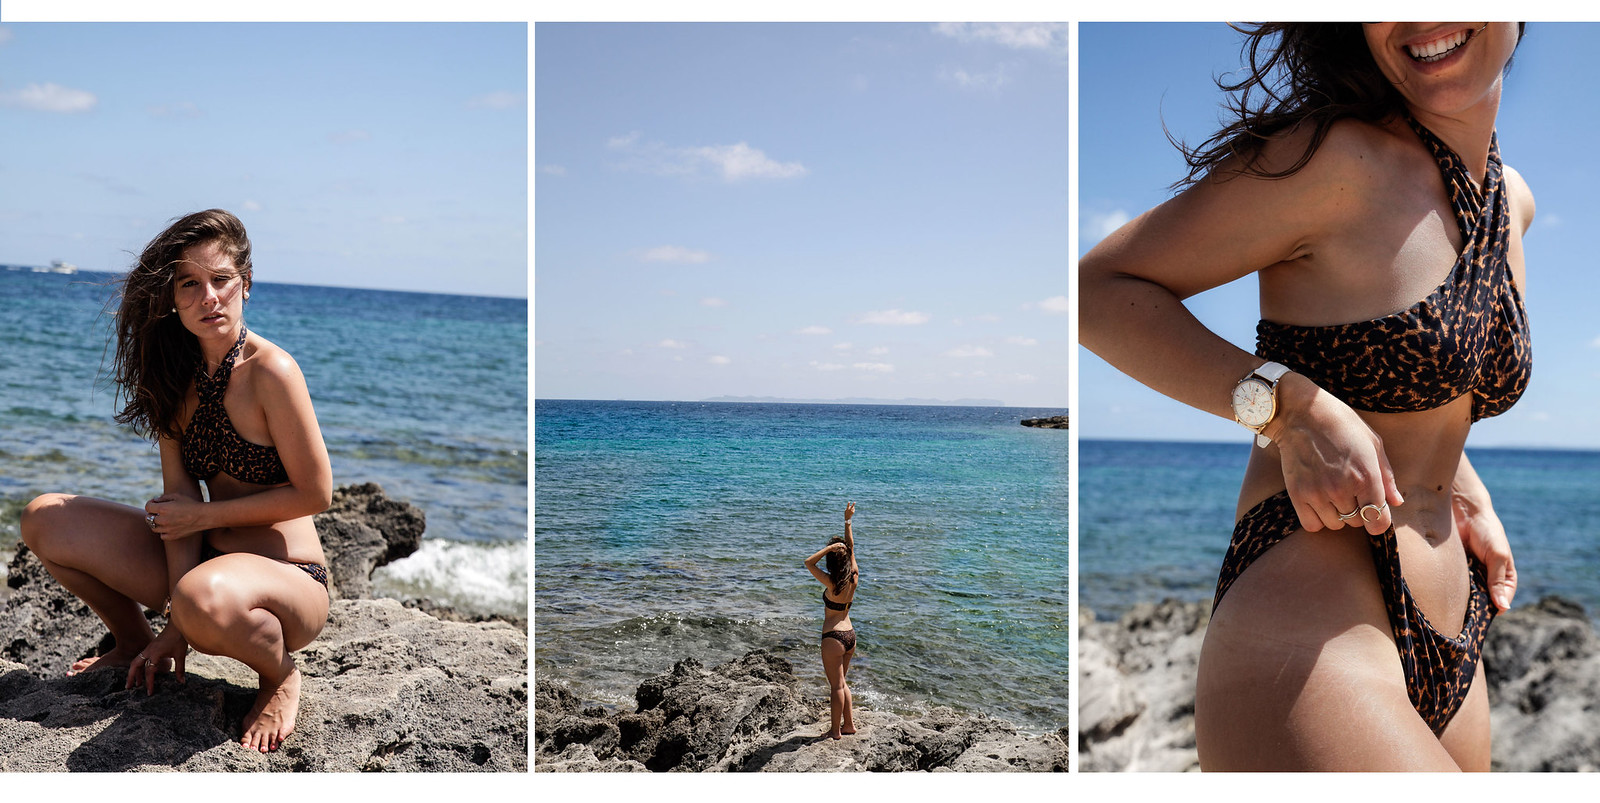 04_beachriot_leopard_swimwear_theguestgirl_summer_the_guest_girl_laura_santolaria_mediterranean_girl_mejor_bañador_2017_bikini_sexy_laura